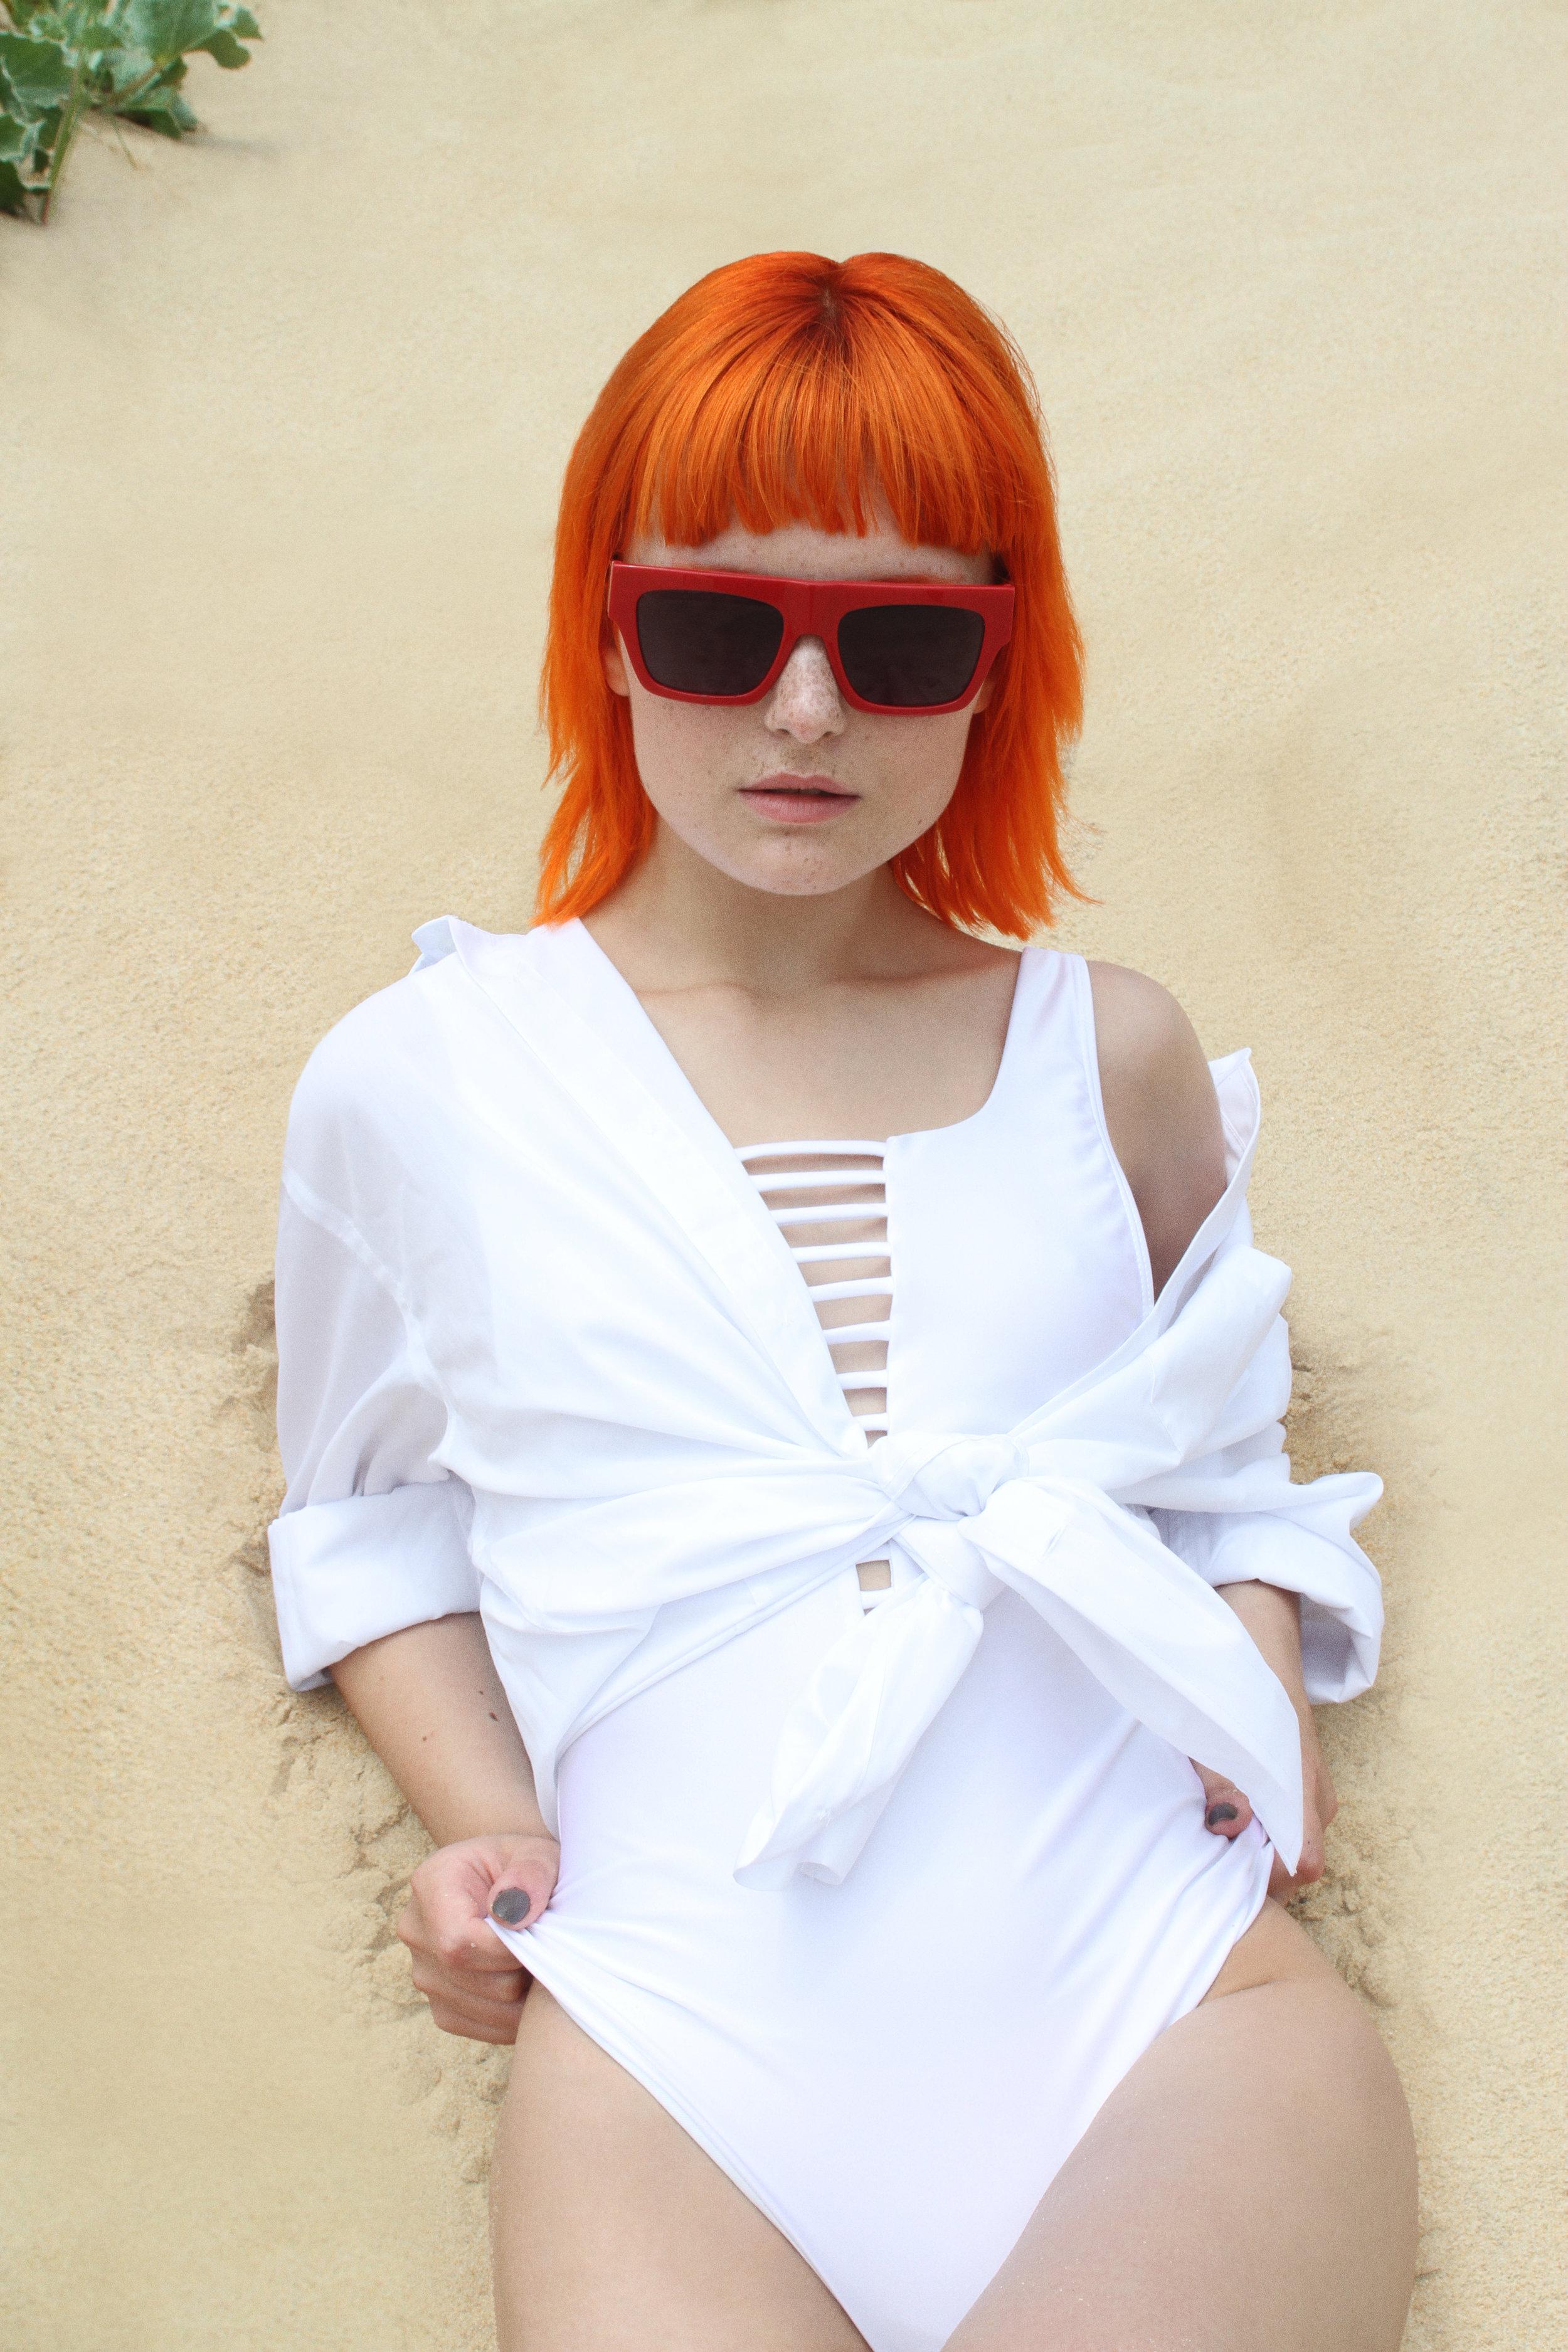 Shirt Primark, Bathing Suit Pull & Bear, Sunglasses Bimba y Lola